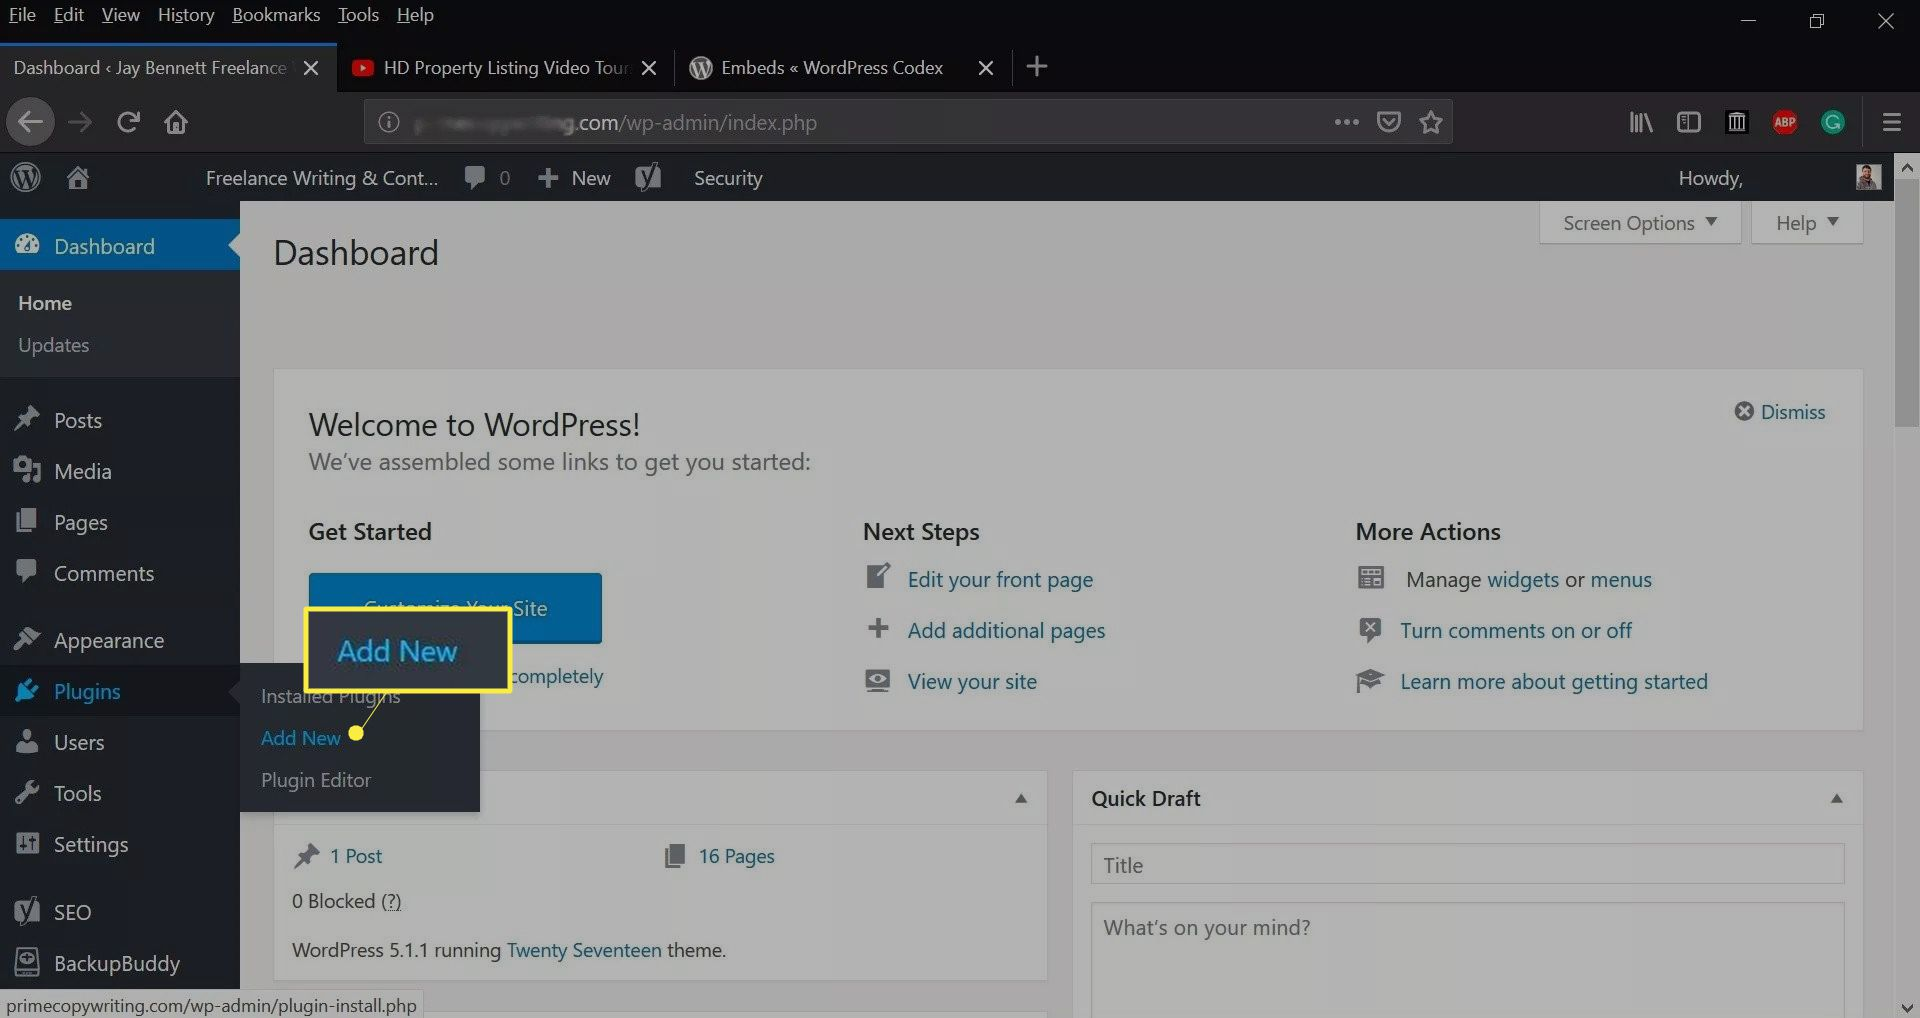 Add New on the WordPress dashboard